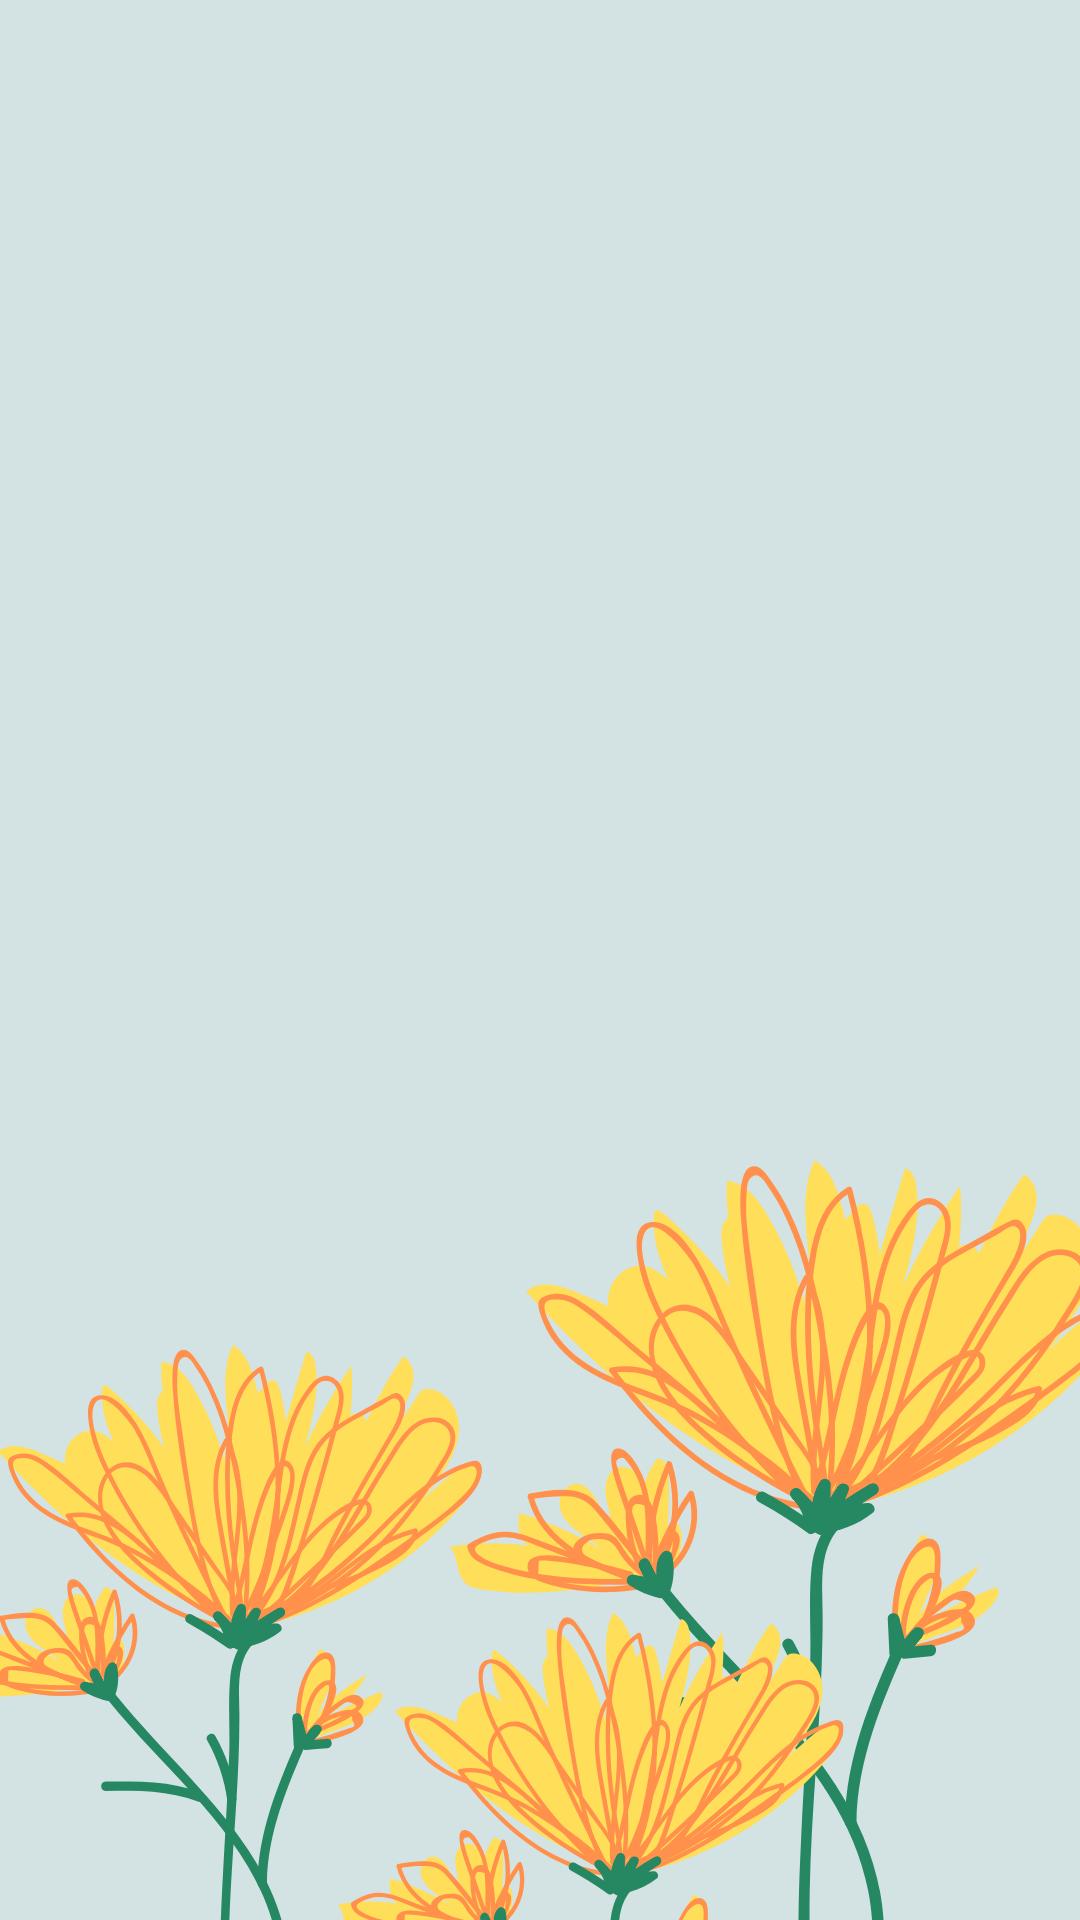 Artsy Aesthetic Wallpaper : artsy, aesthetic, wallpaper, Spring, Phone, Wallpapers, Flower, Wallpaper,, Wallpaper, Patterns,